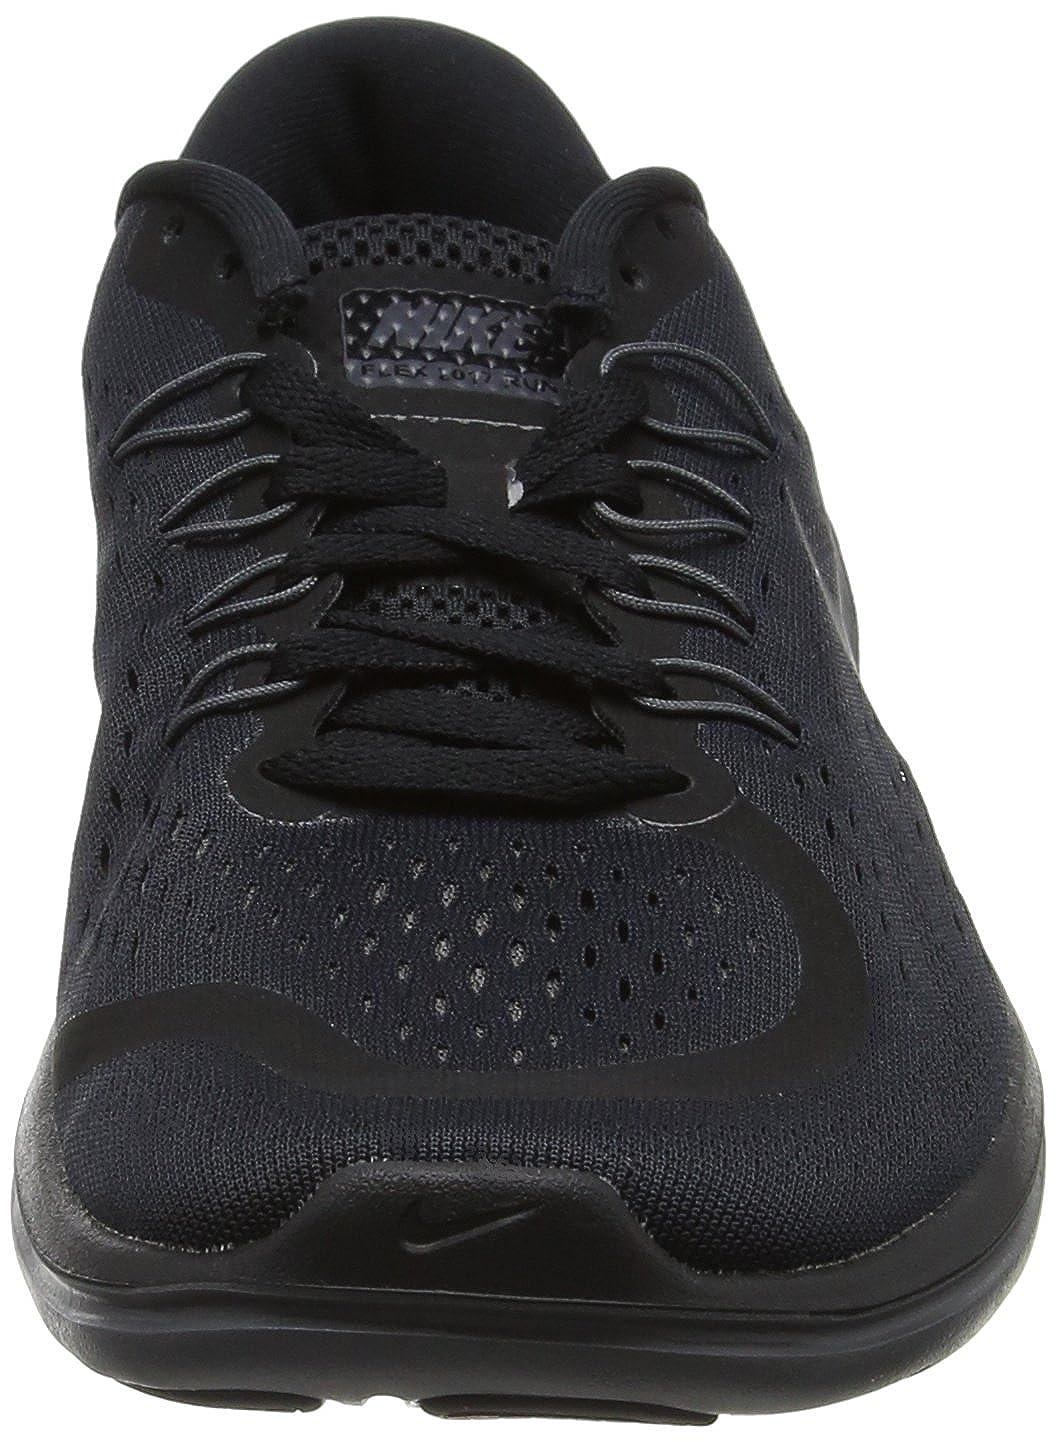 pretty nice 5baa8 8fbf2 Amazon.com   Nike Men s Free Rn Sense   Road Running